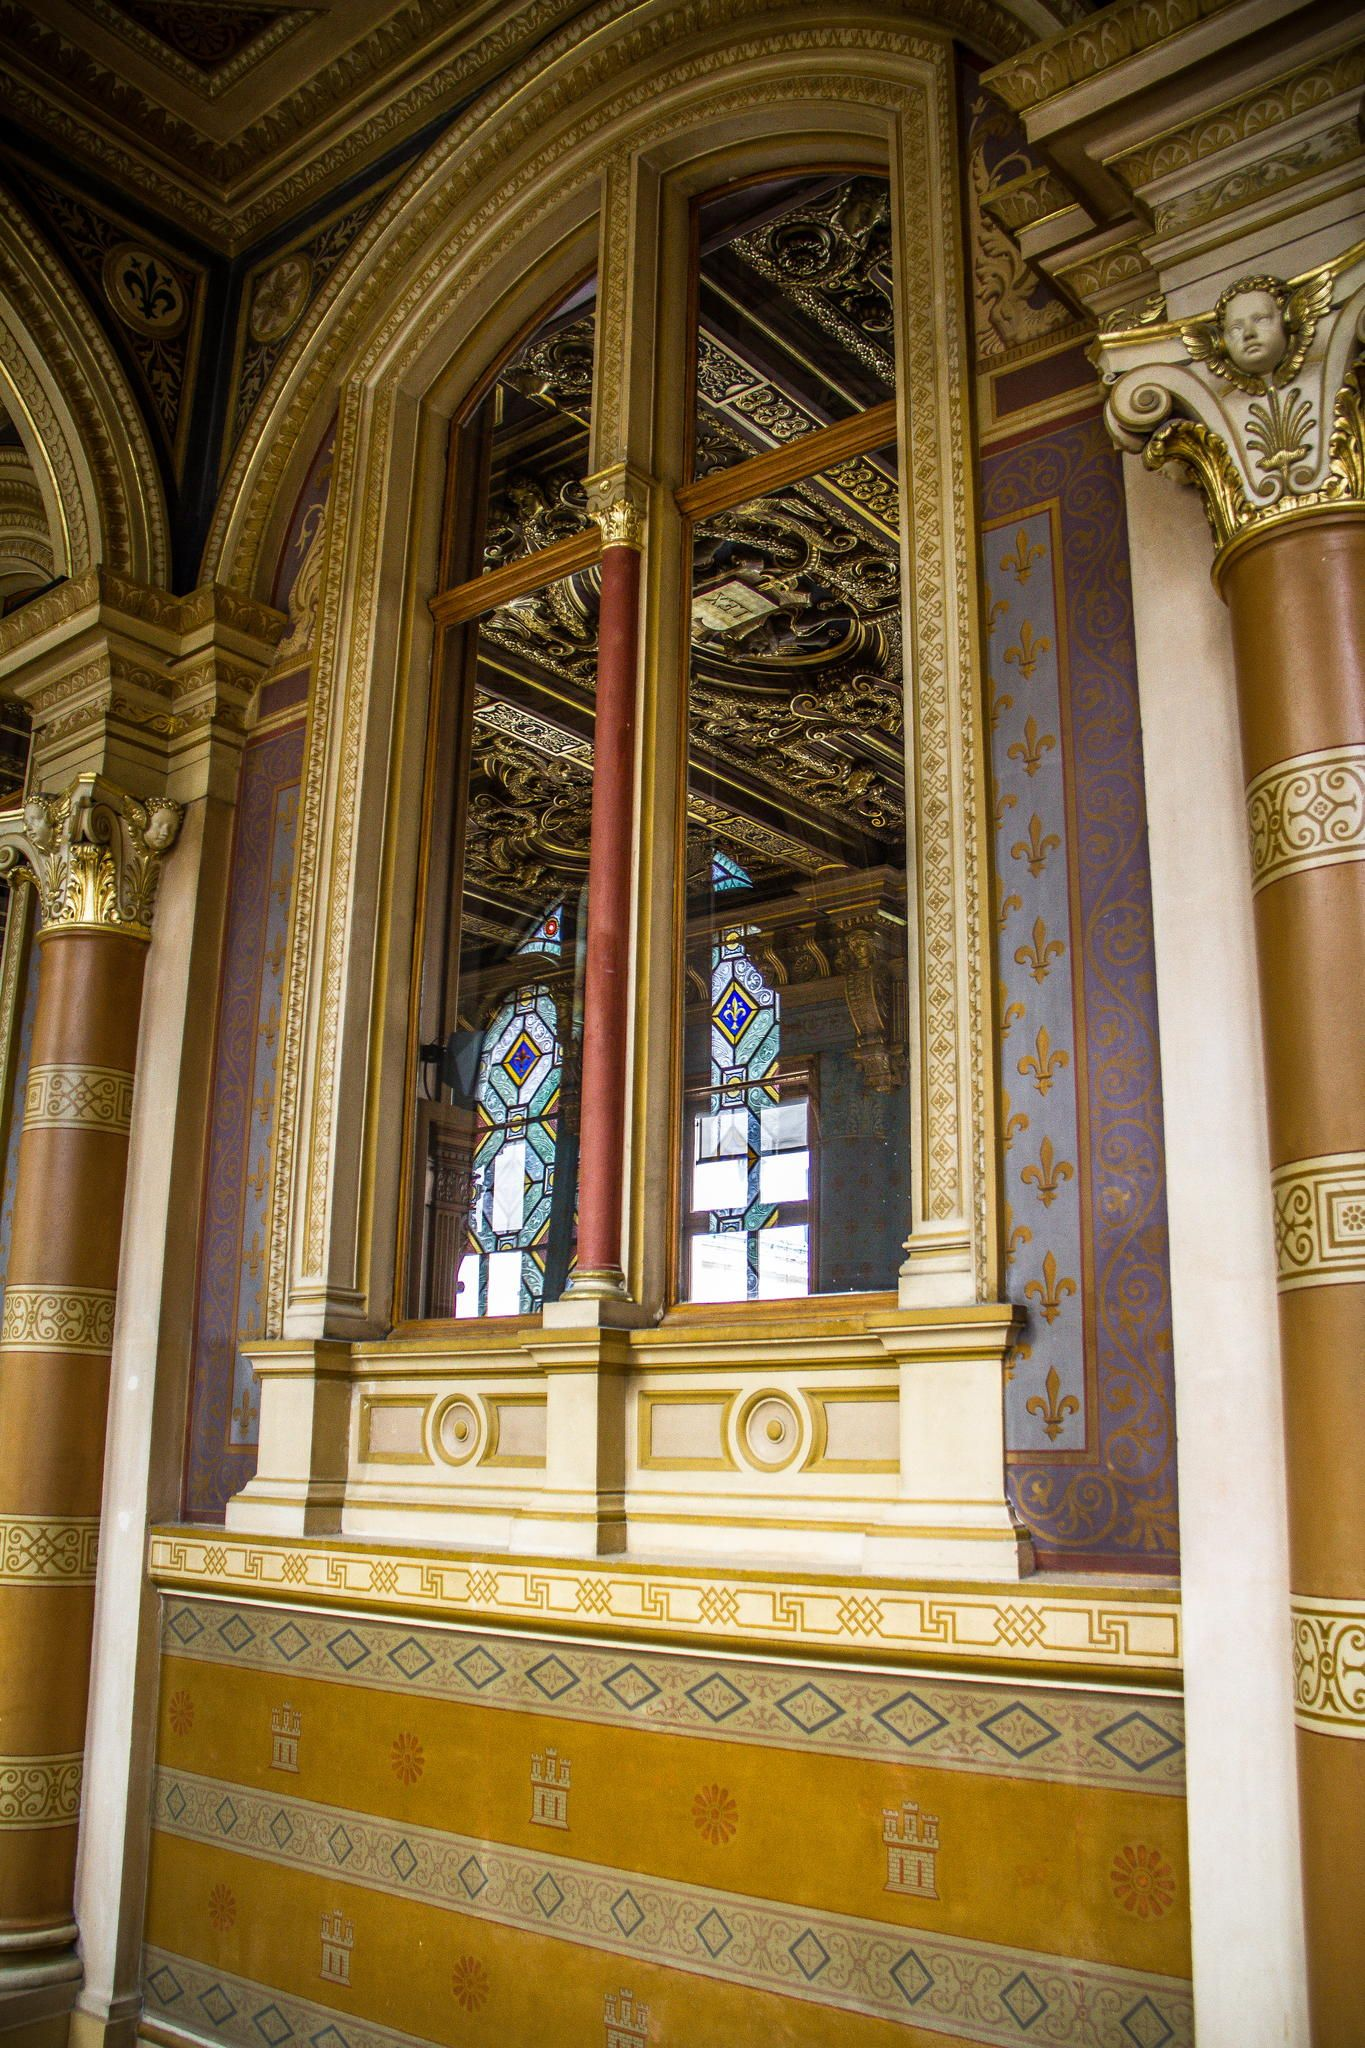 Palais de Justice by Jean-Marc PAYET on 500px